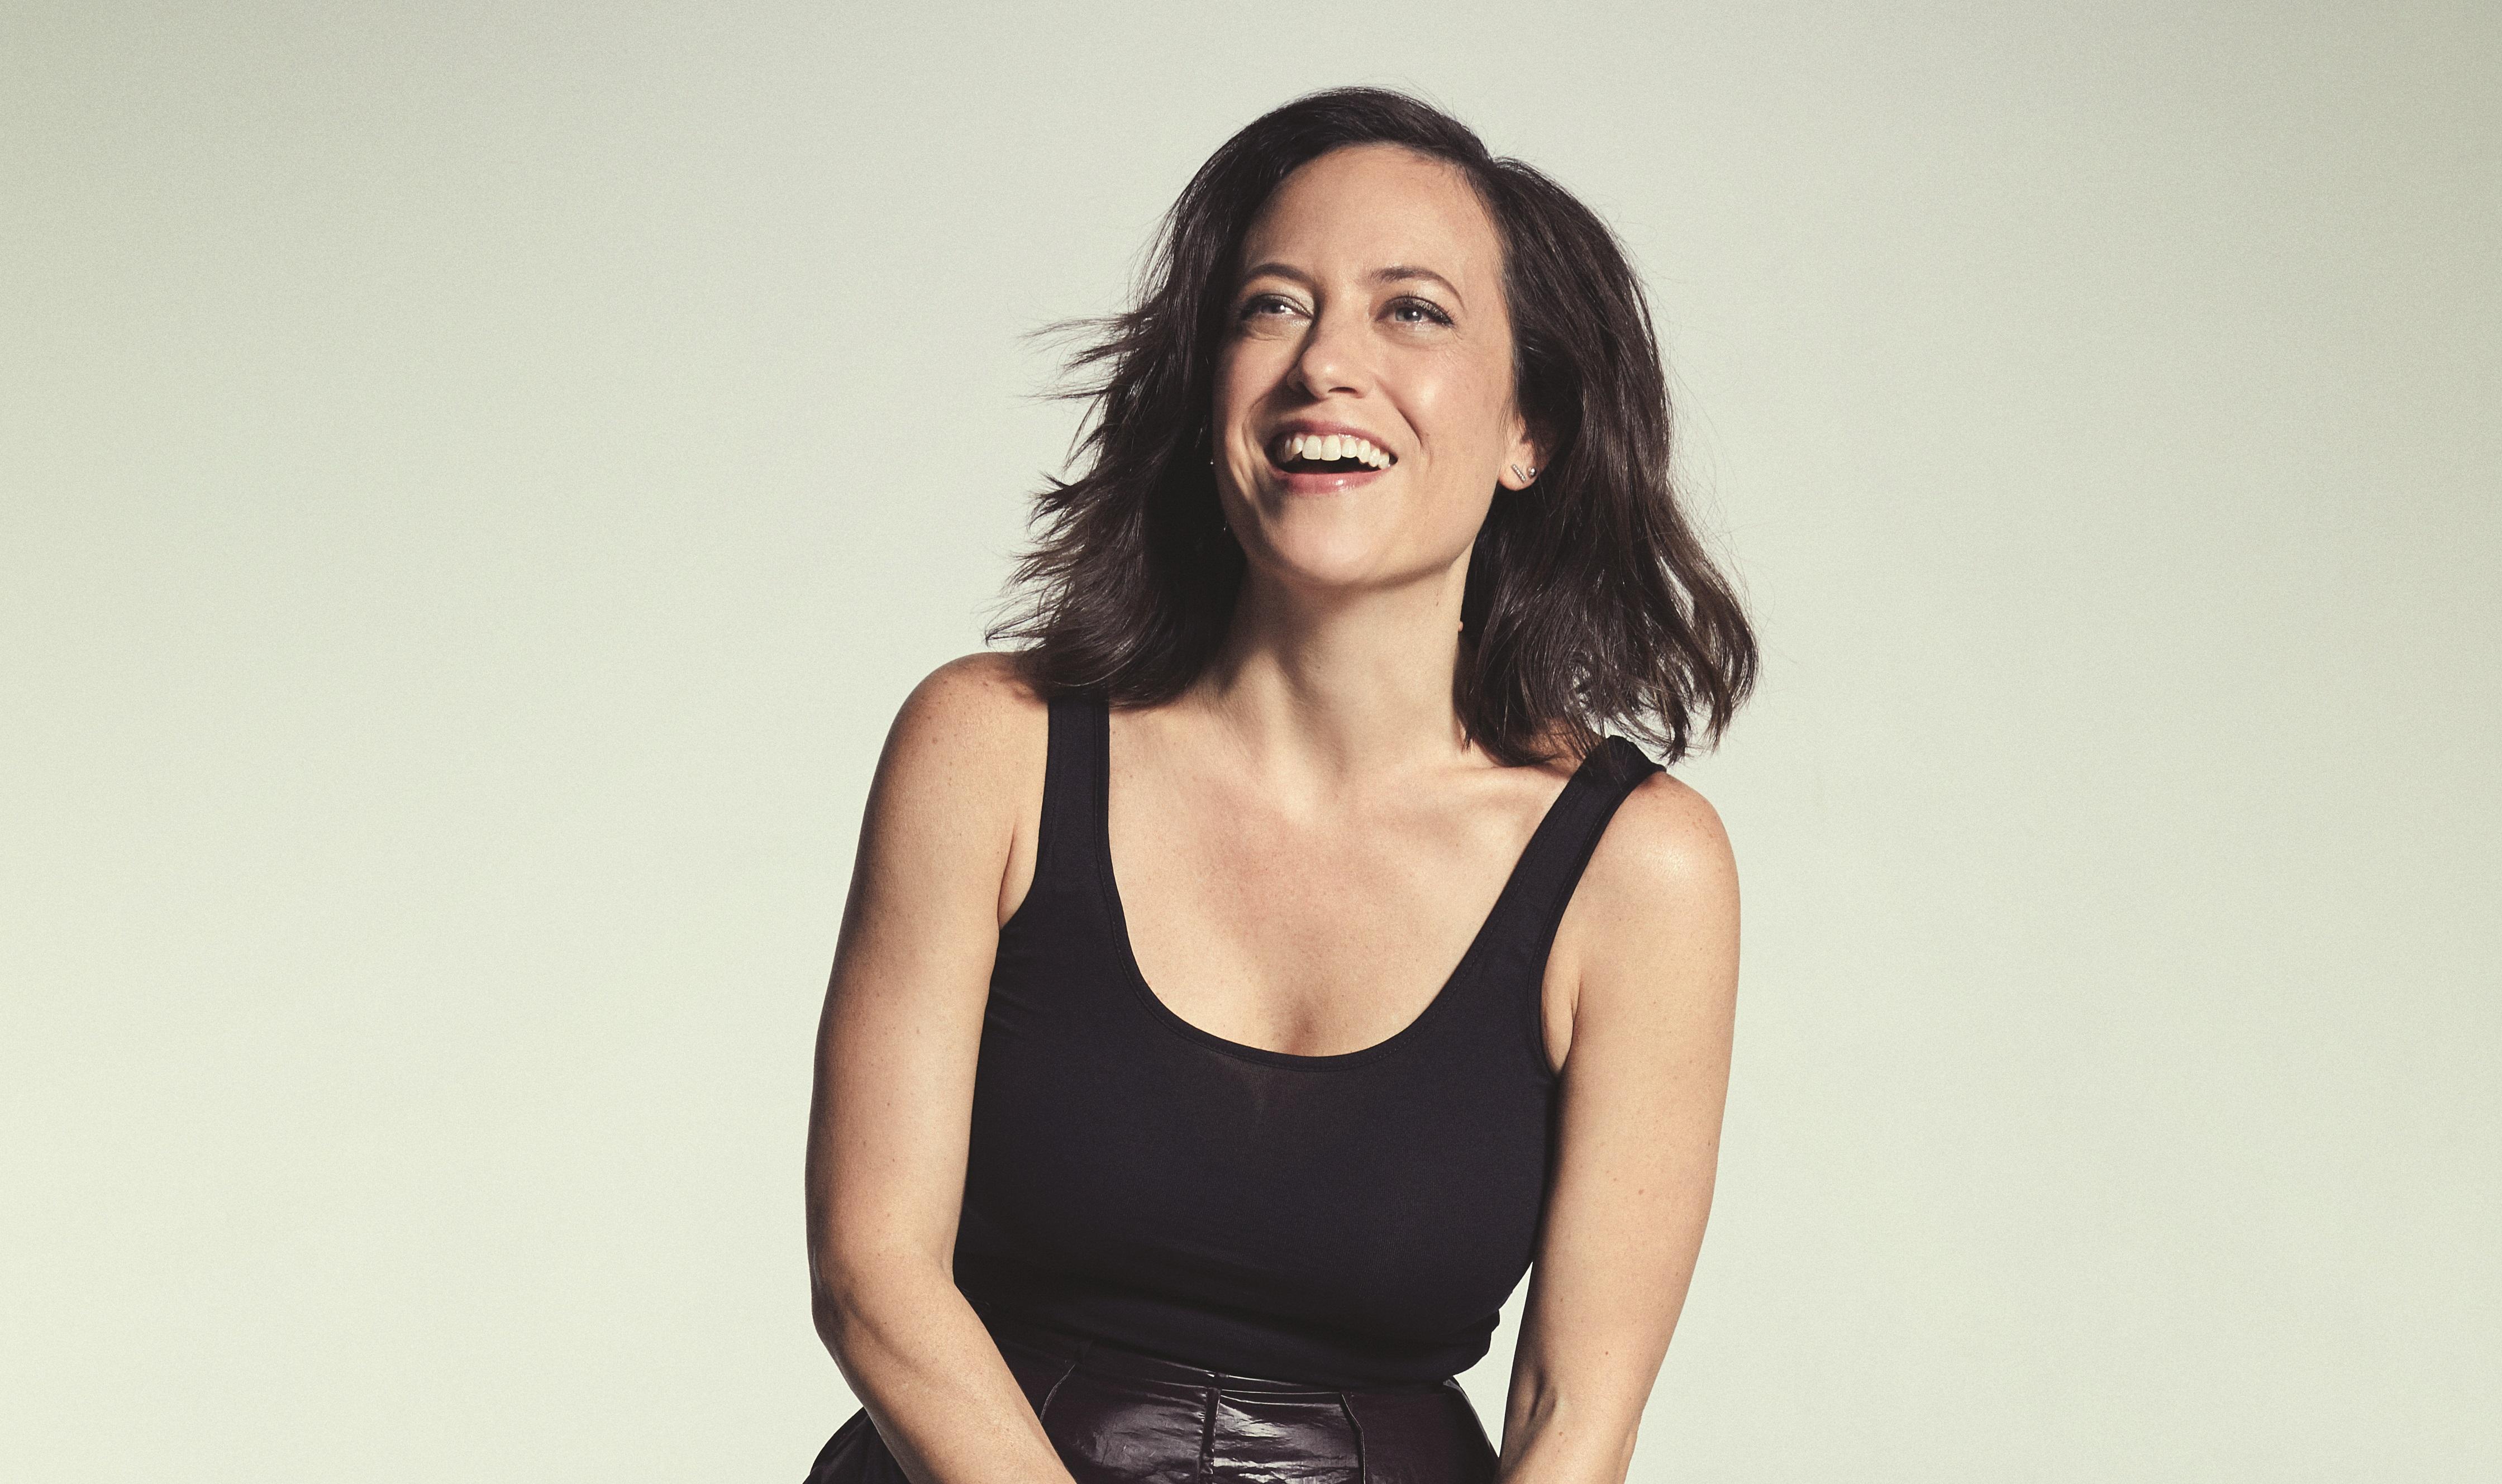 Showrunner Lauren Schmidt Hissrich On Her Netflix Hit <i>The Witcher</i>